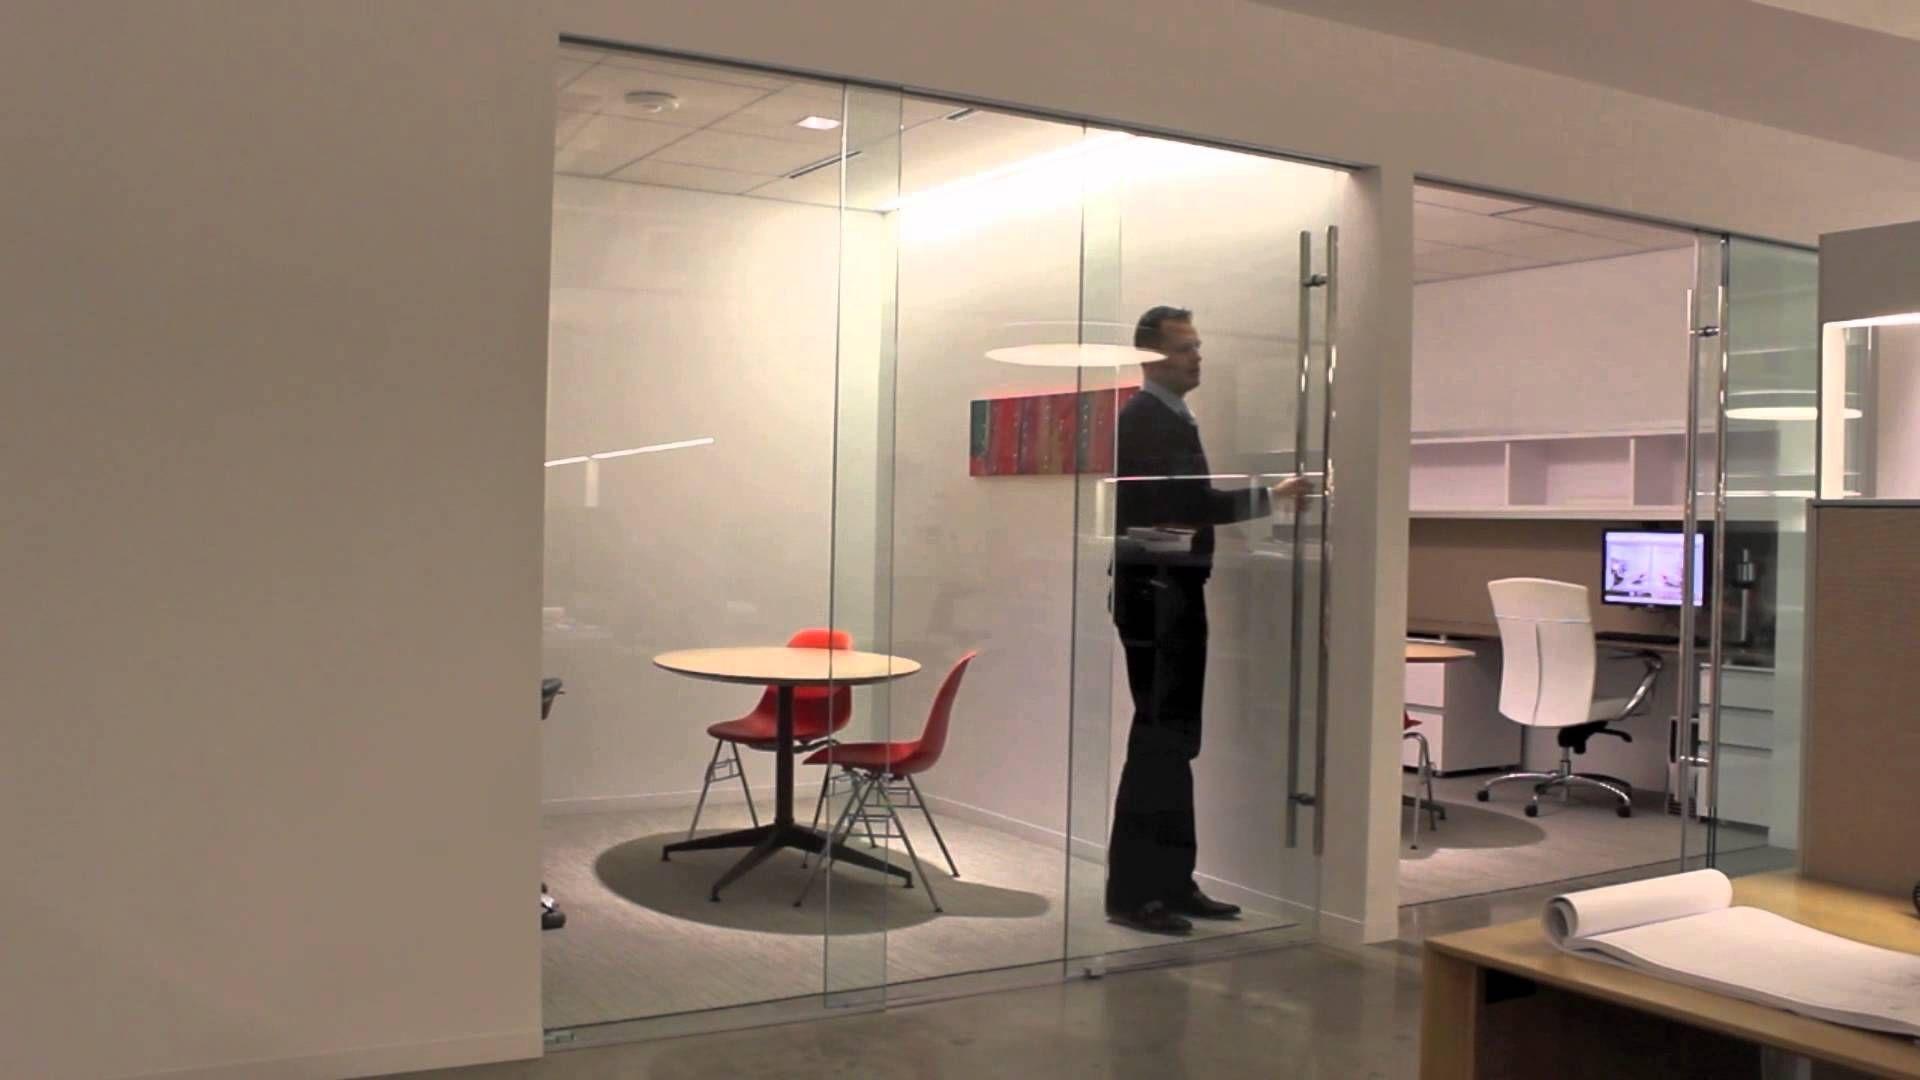 Extendo telescopic frameless glass doors klein usa 50914246 choosing a french door for your home